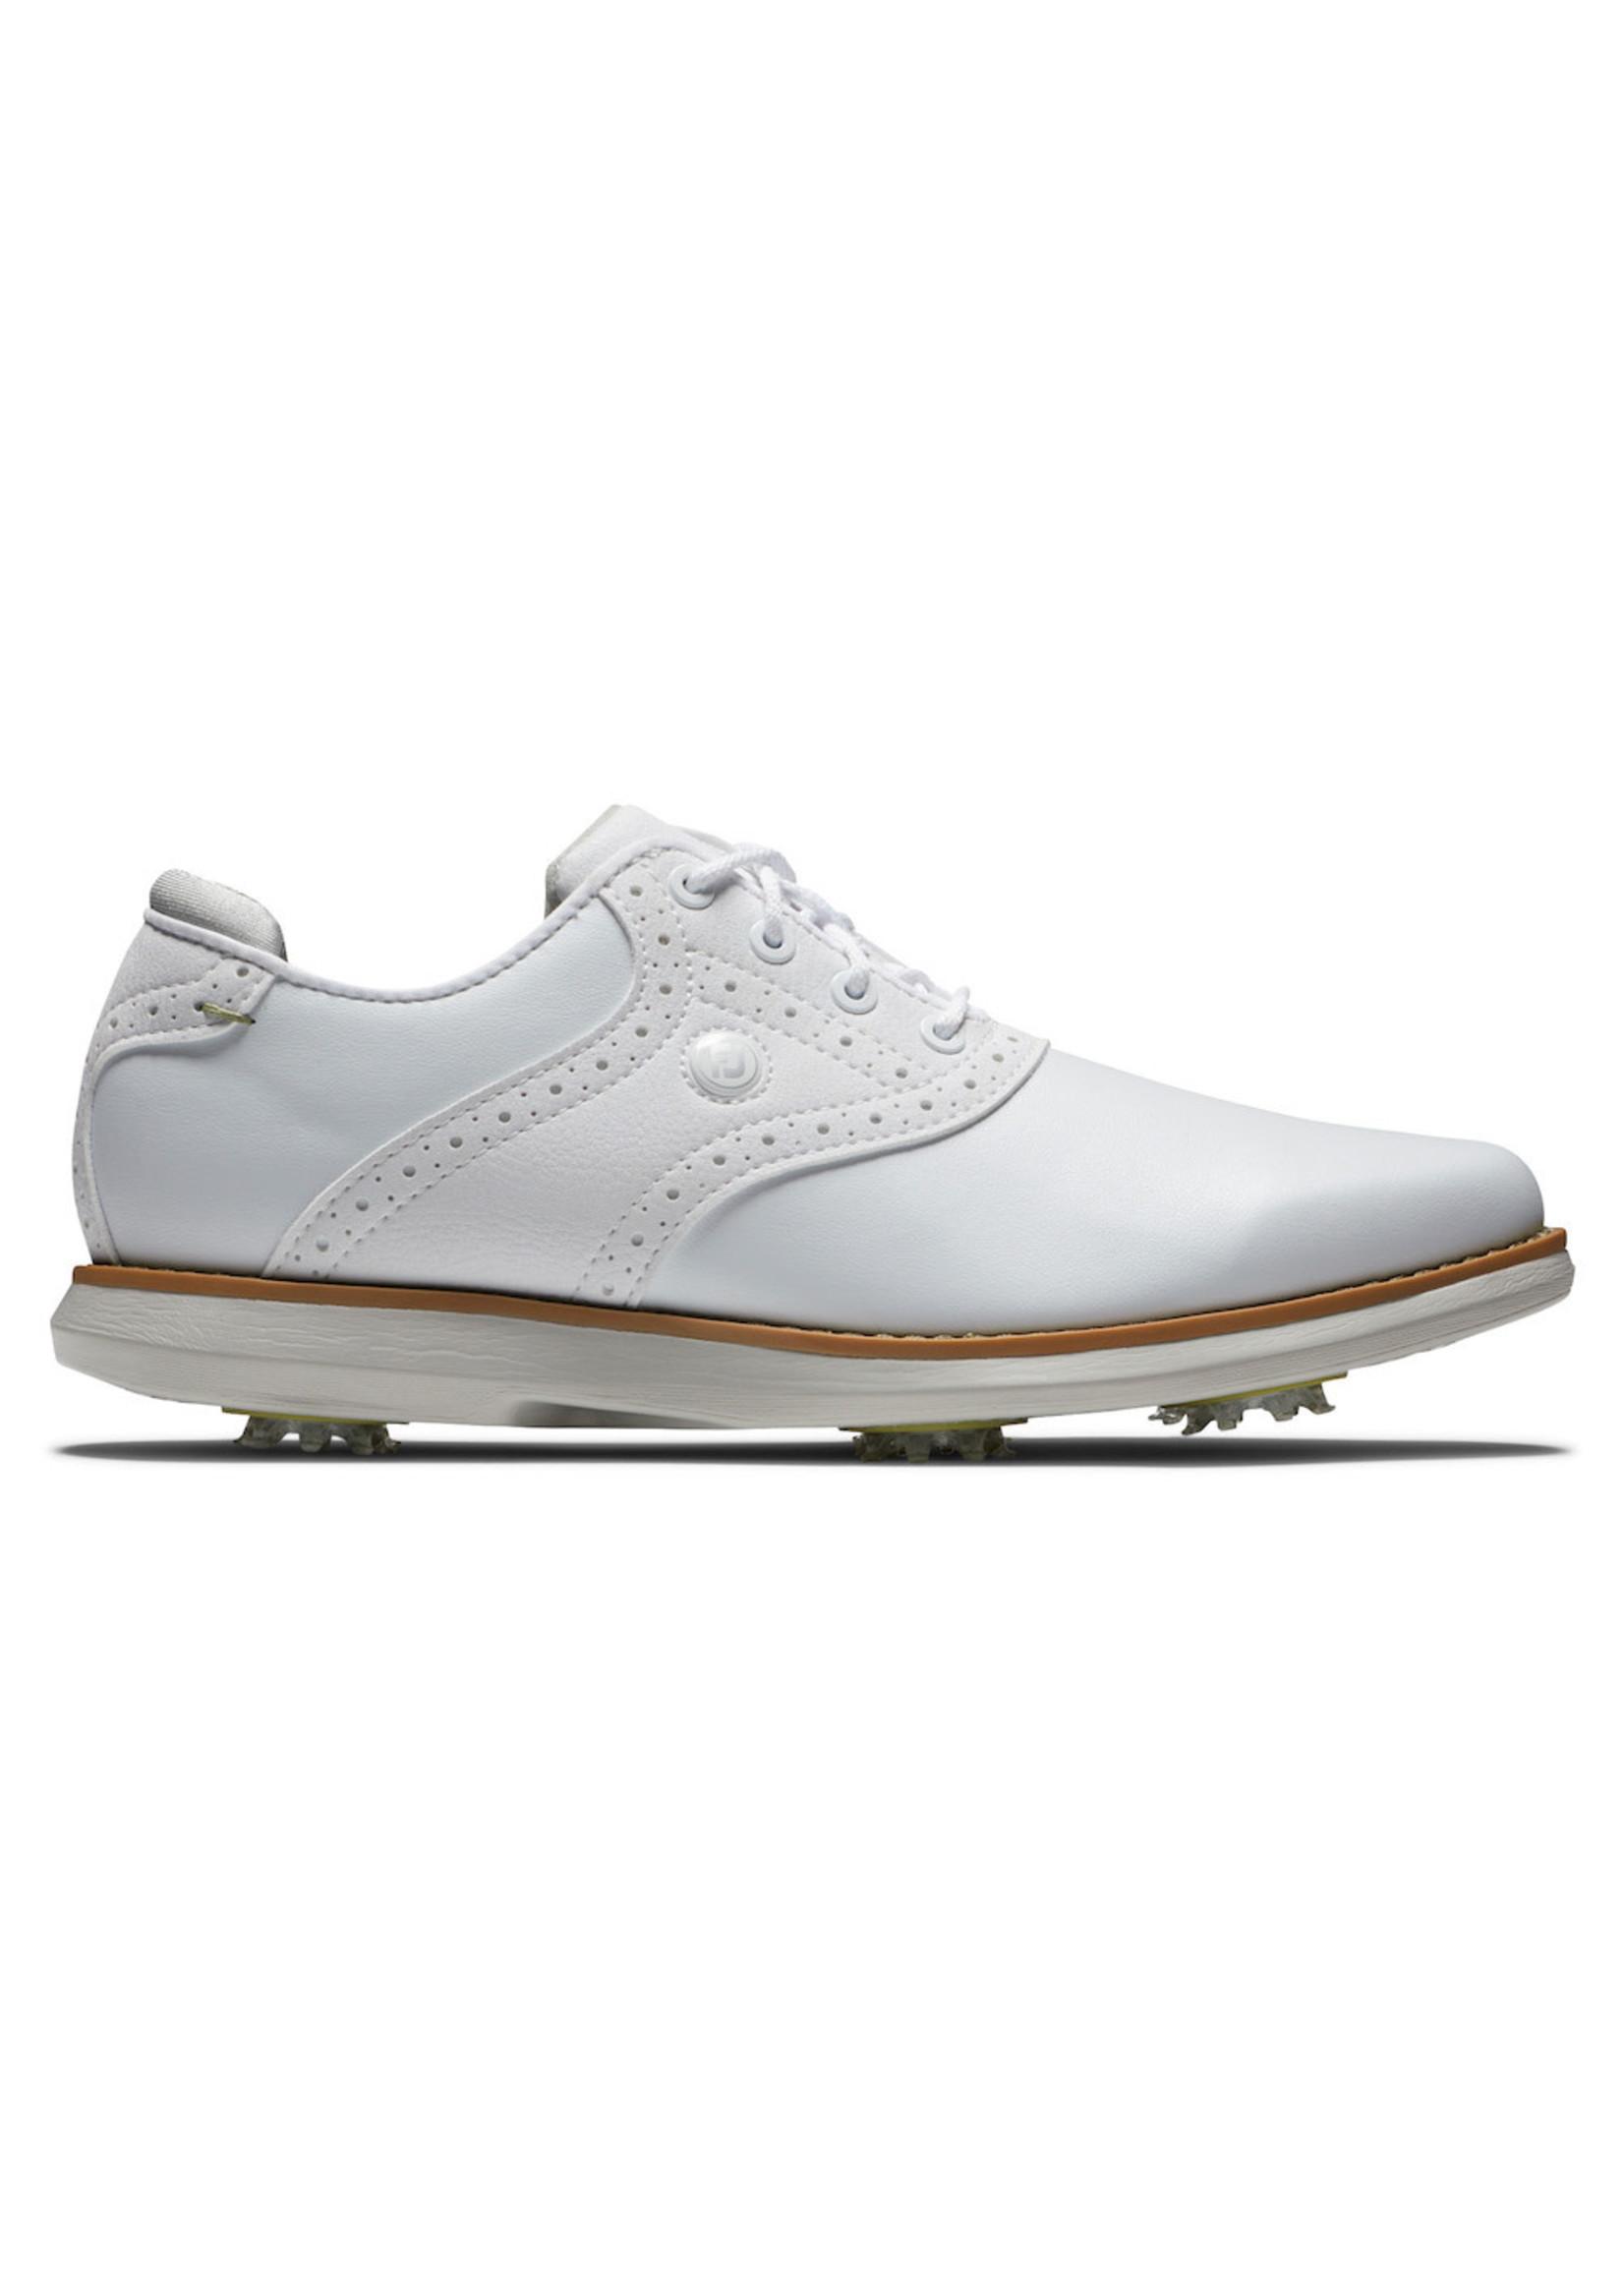 Footjoy FootJoy Traditions Ladies Golf Shoe, (2021)